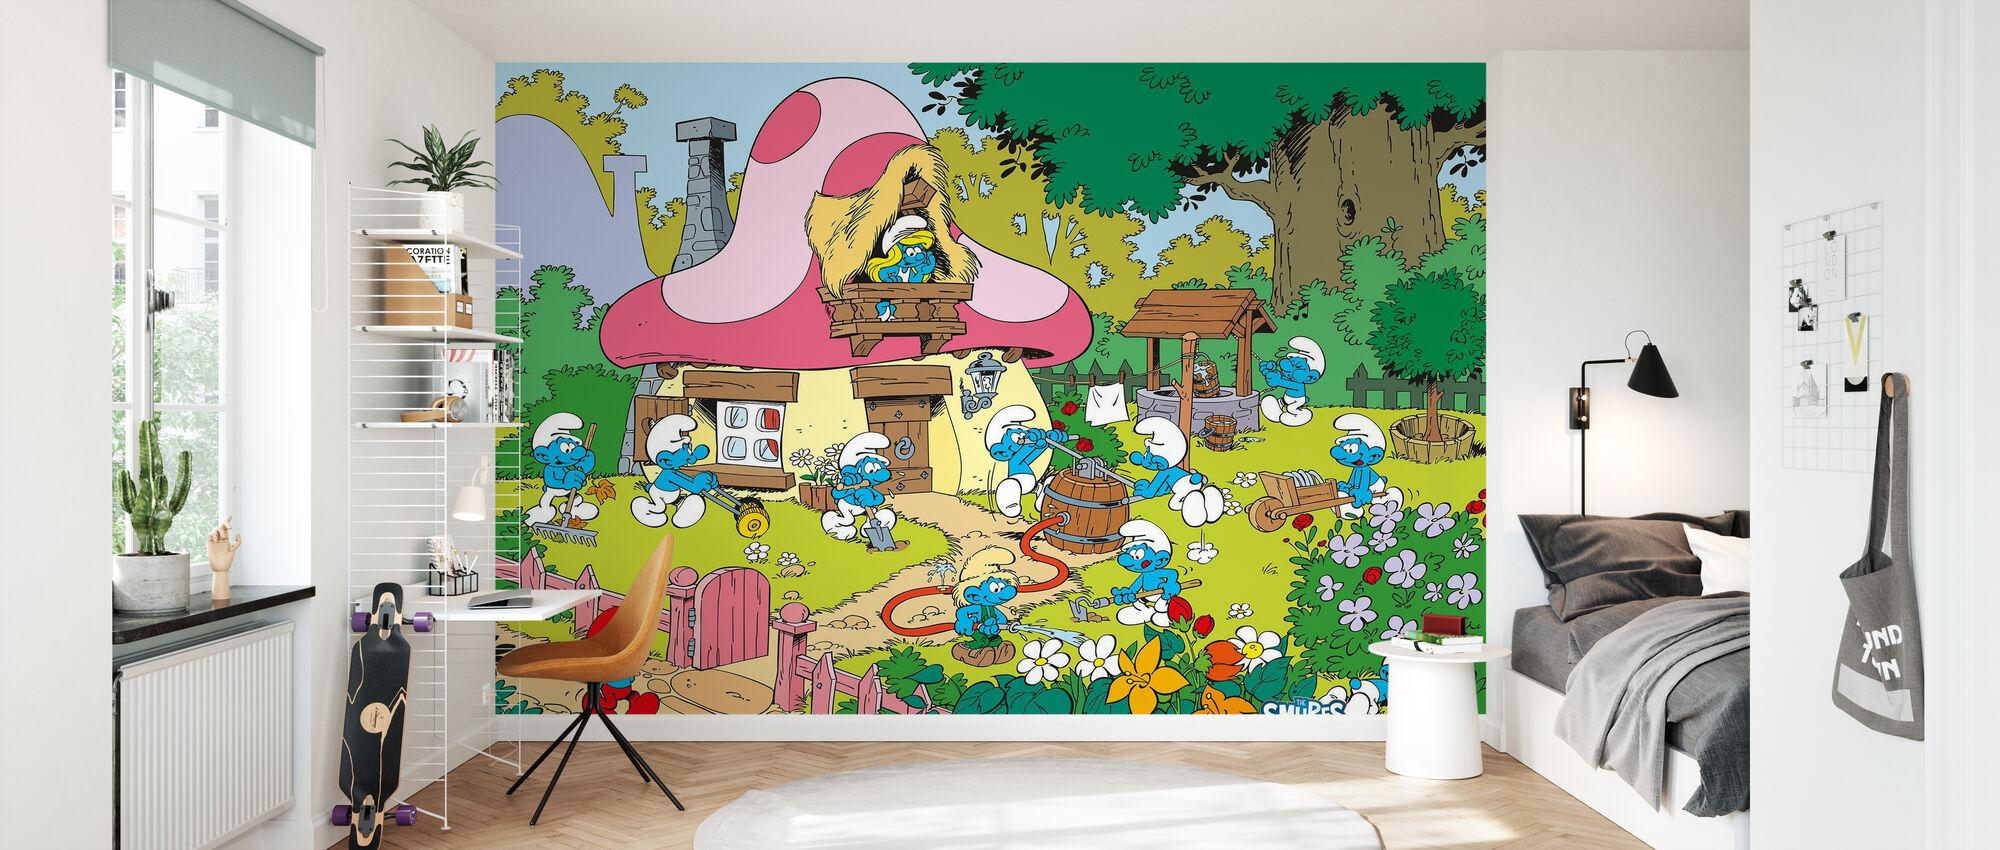 Smurfs - Spring - Wallpaper - Kids Room